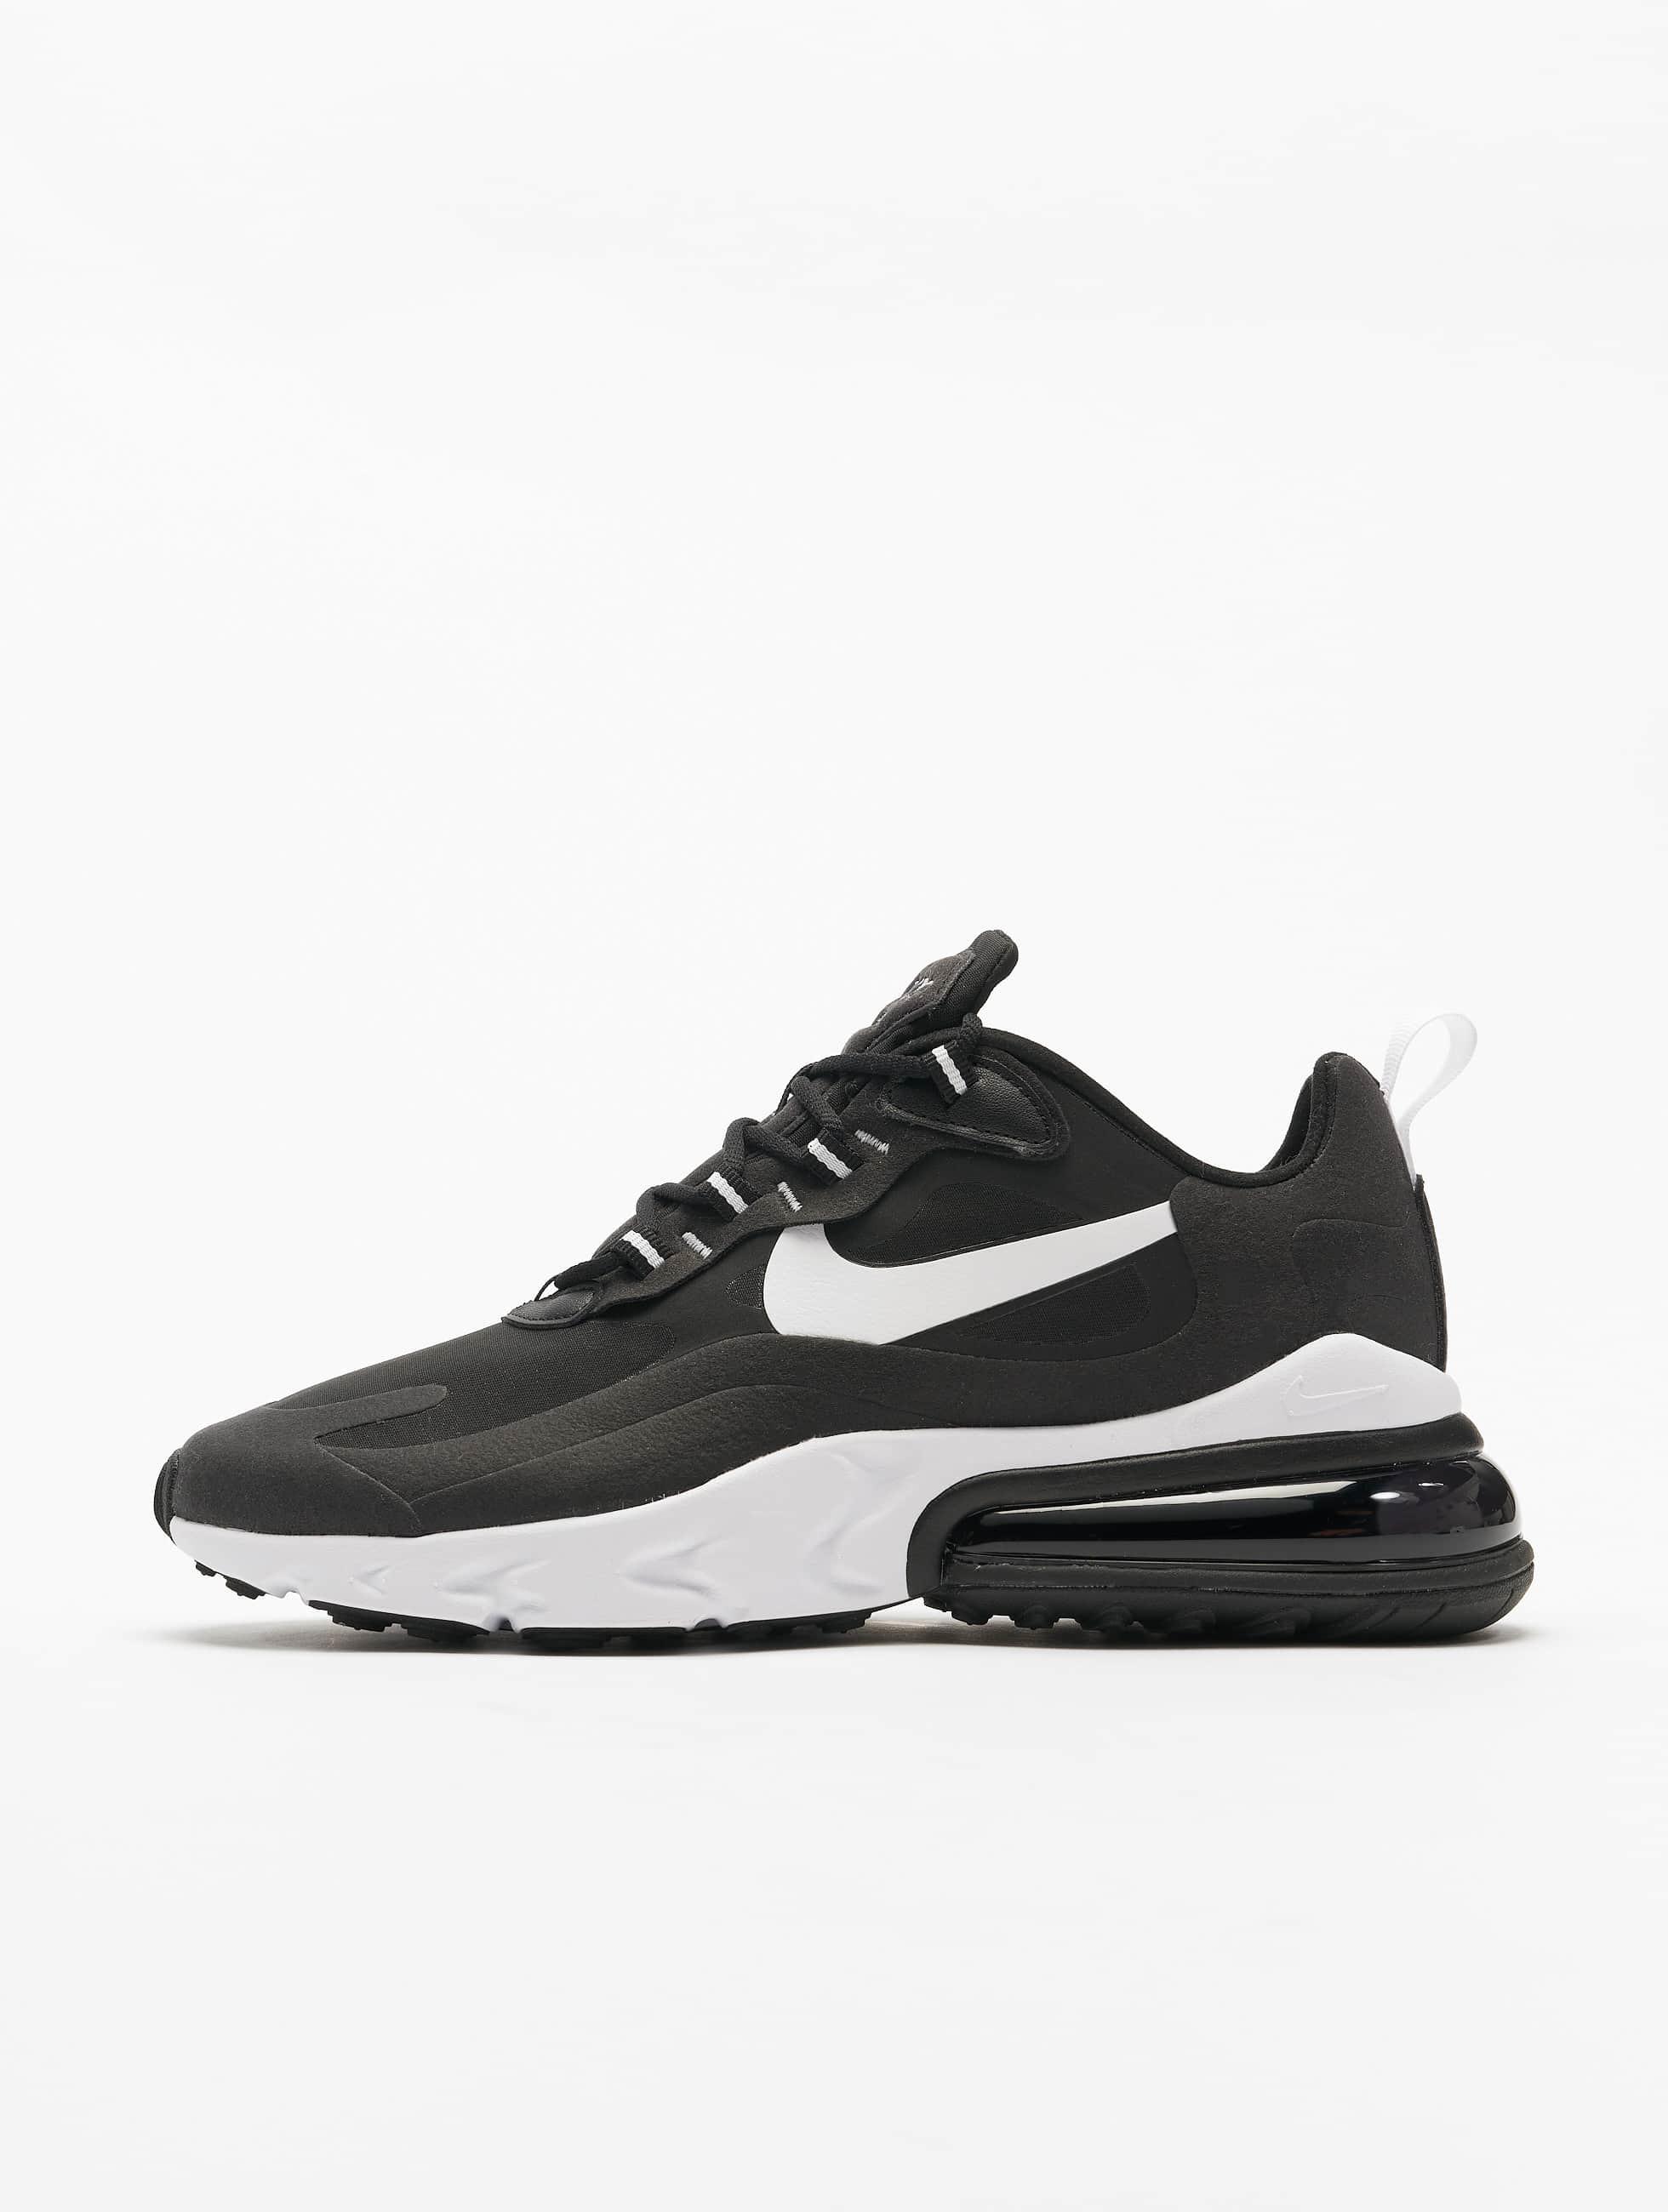 Nike Air Max 270 React Sneakers BlackWhiteBlack